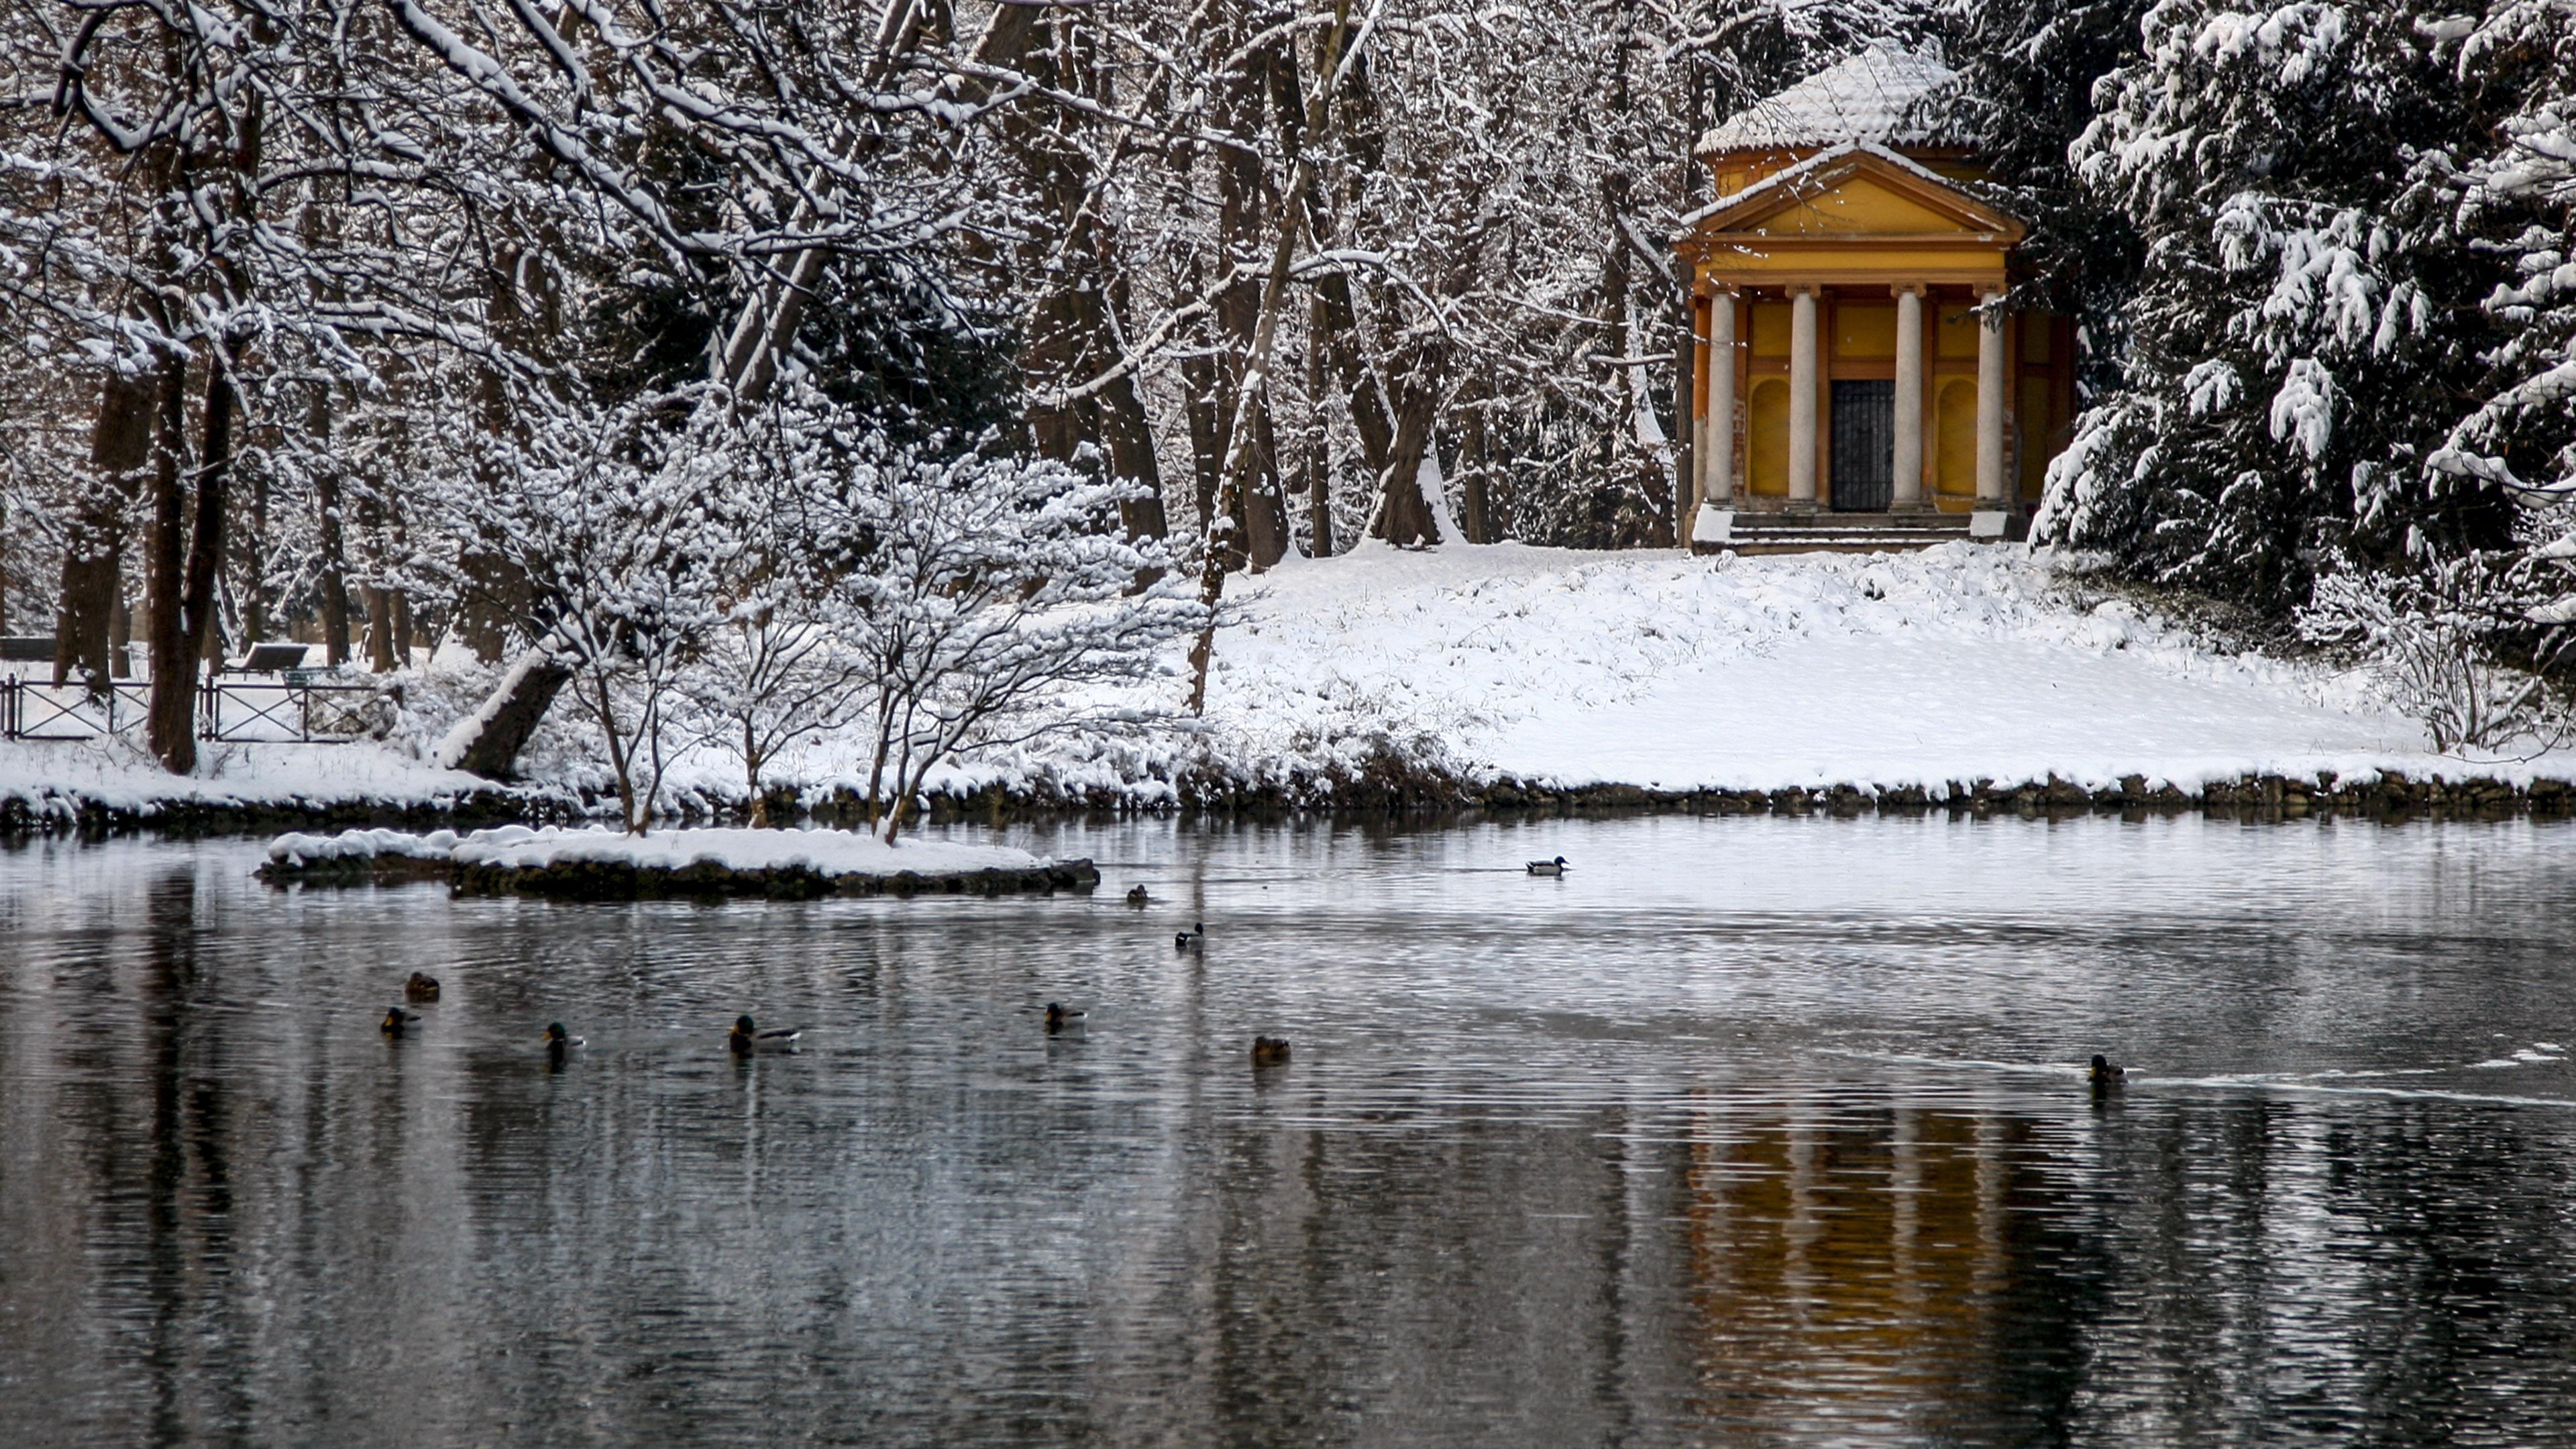 Tempio Parco di Monza